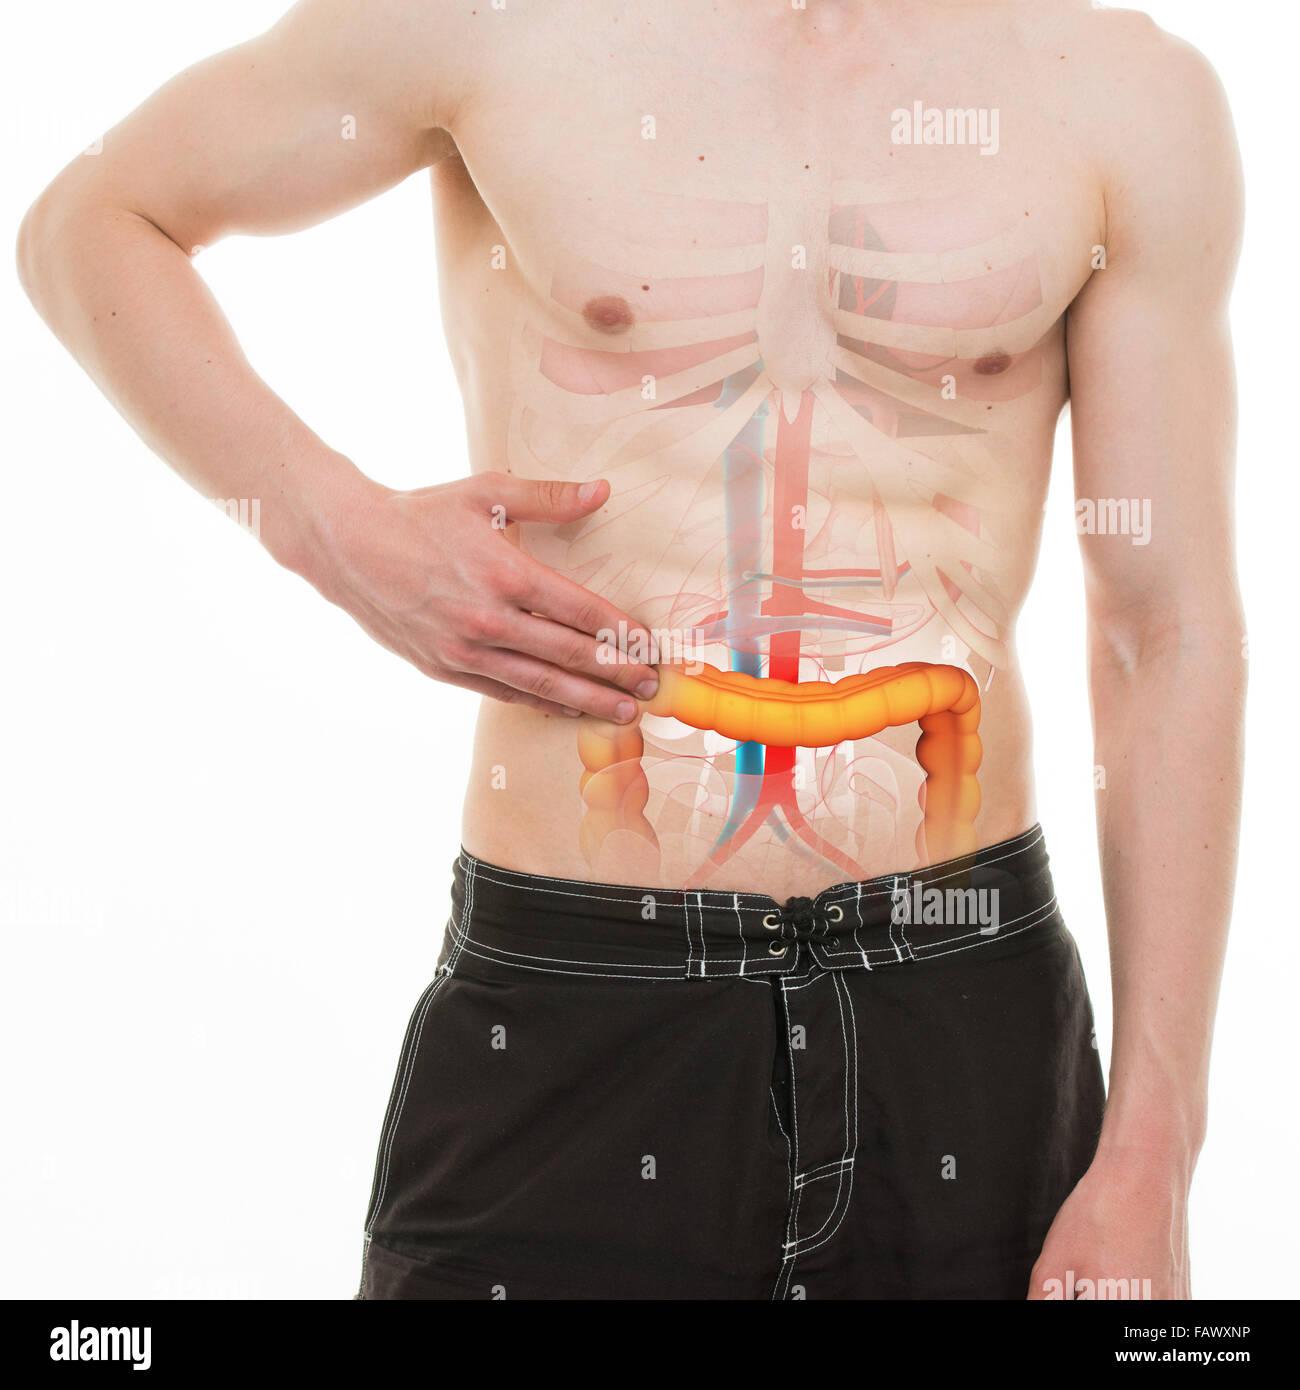 Bauchschmerzen - Darm Darm rechts Schmerzen - echter Anatomie ...